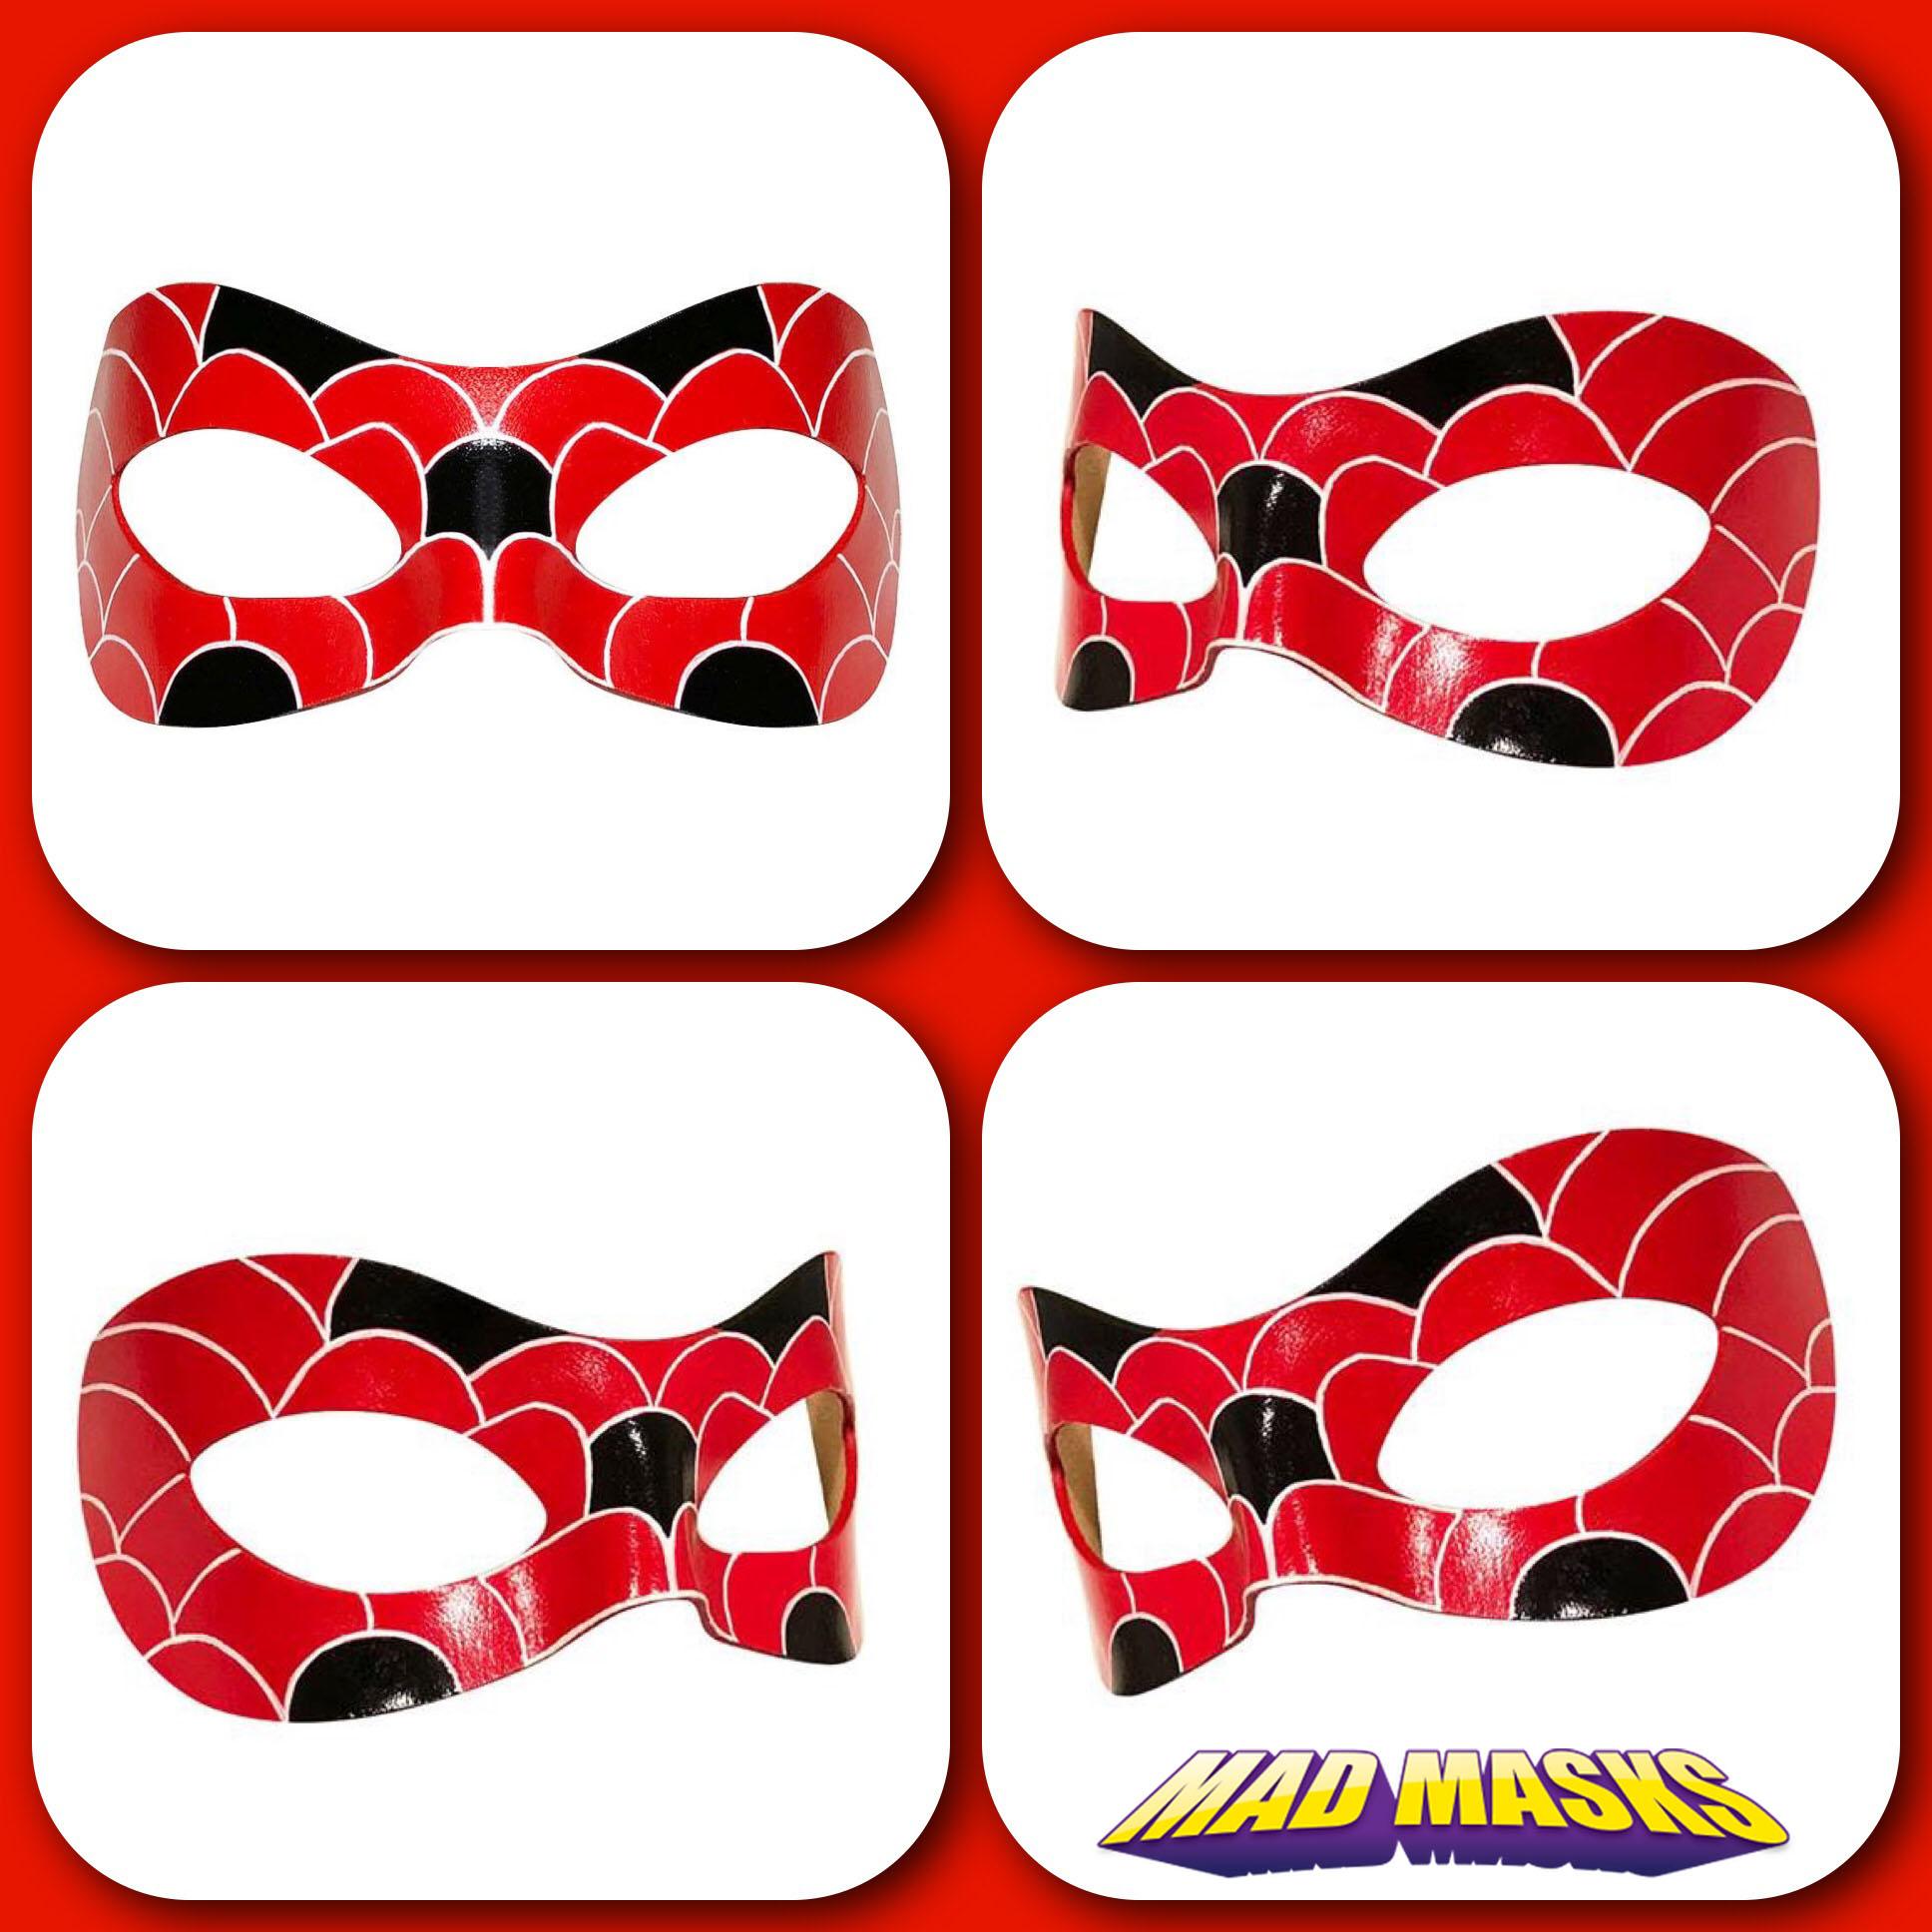 aqua-ladybug-mask-collage.jpg